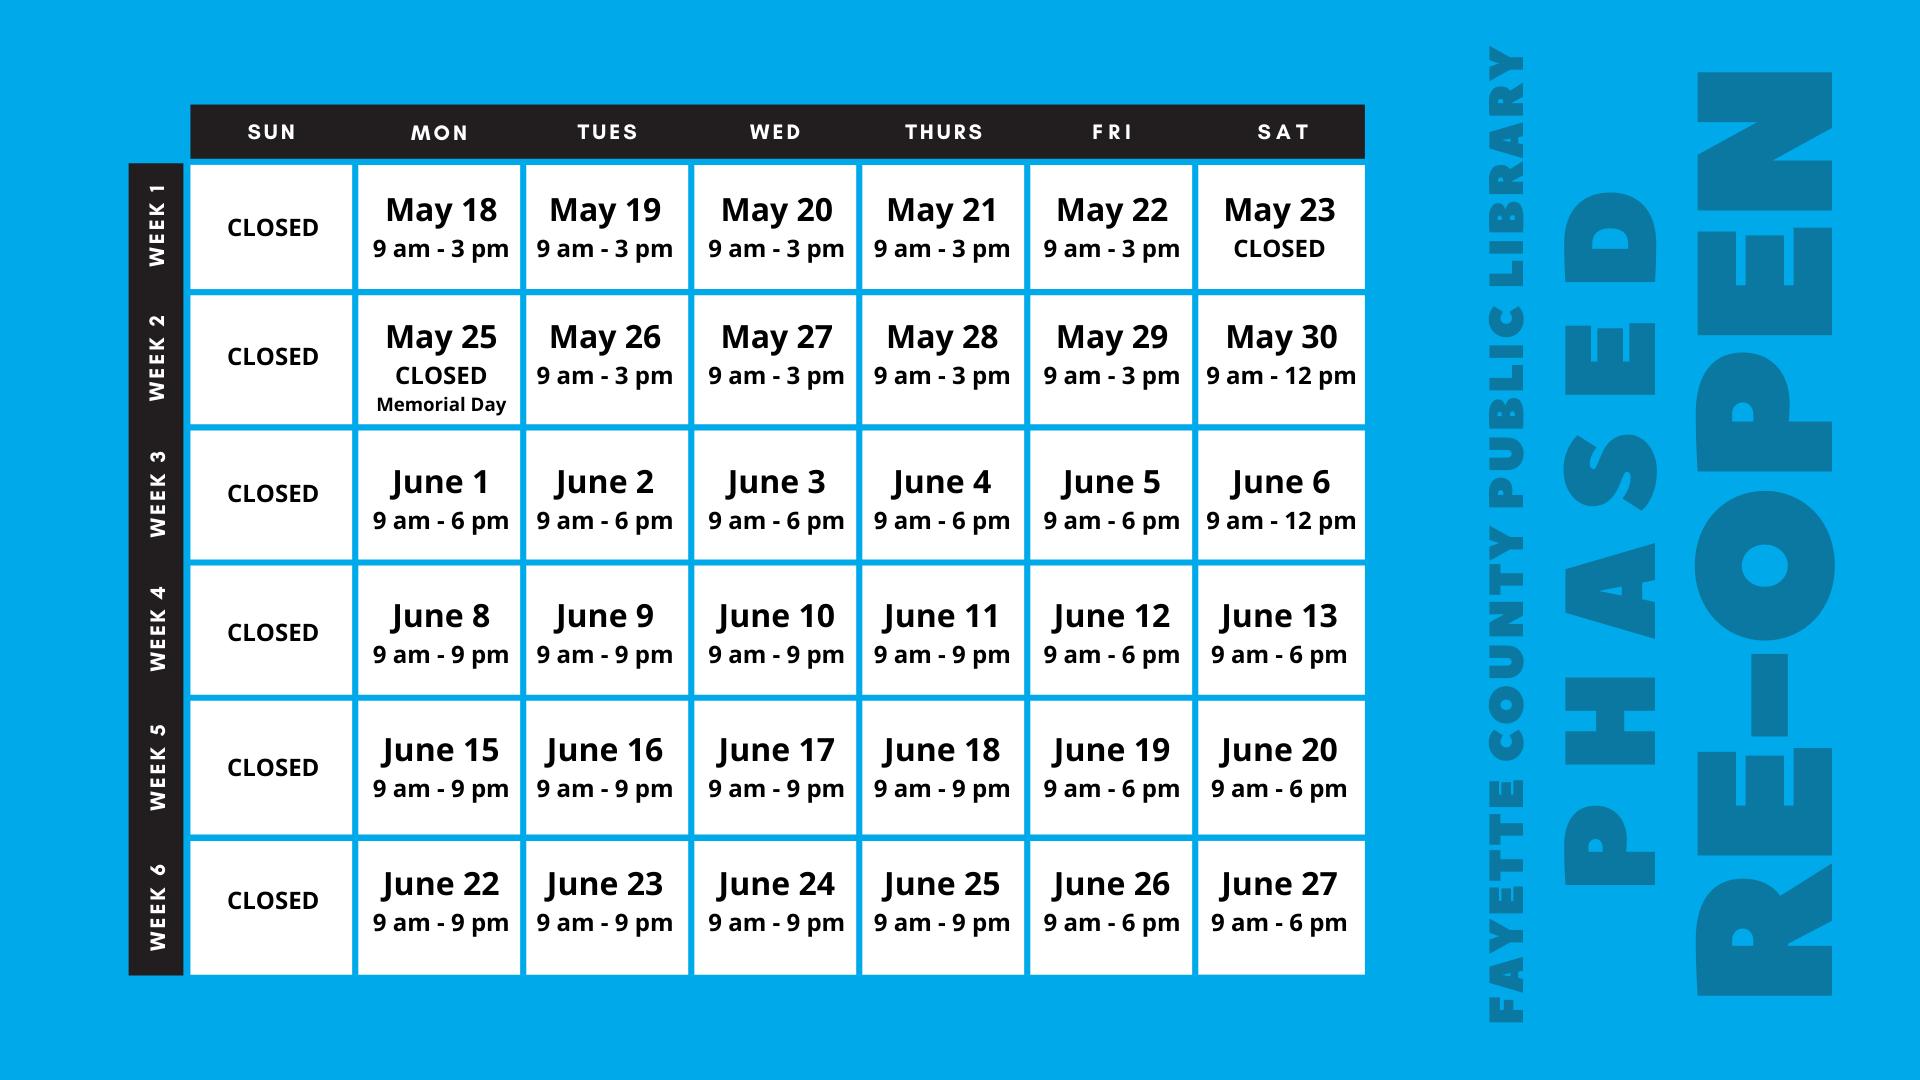 Fayette County Georgia Public School Calendar | Printable In Georgia State 2020 School Calendar